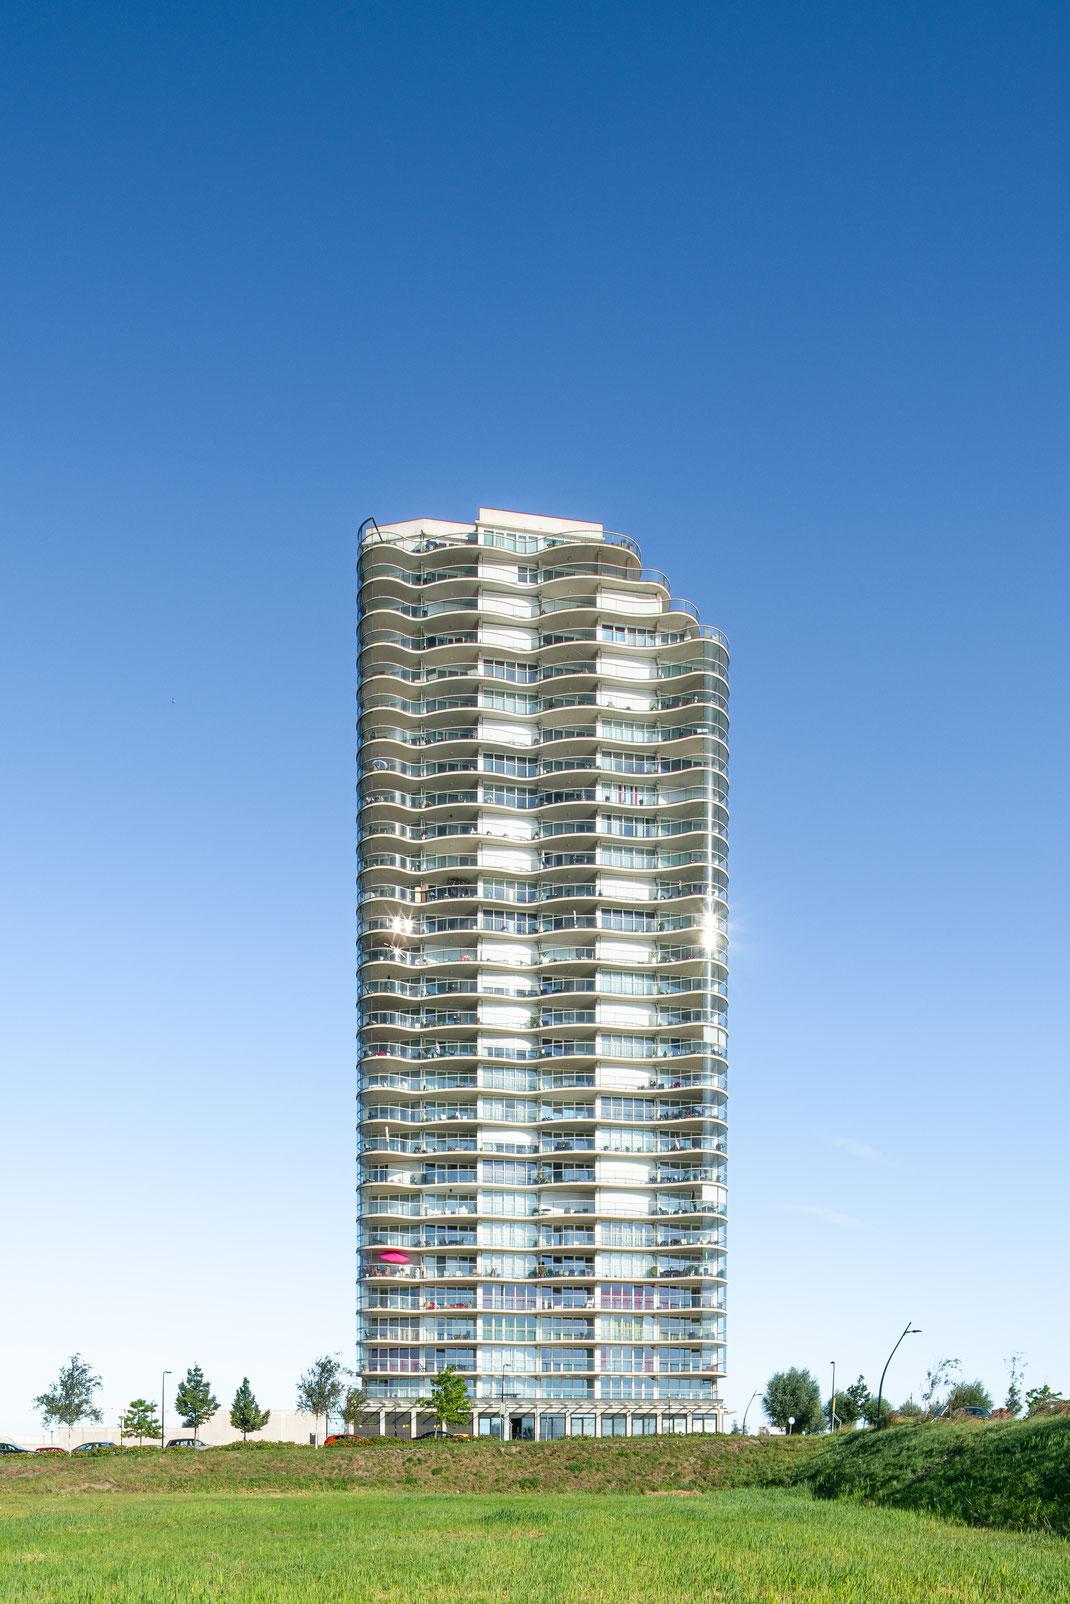 #terrasaandemaas #damenpartners #damenpartnersarchitecten #damenpartners_architecten #spjkenisse #vormbouw #egbertdeboer #egbertdeboerfotografie #hendriksgroep #iob #toren #architecture #architectuur #rollecate #kolfenmolijn